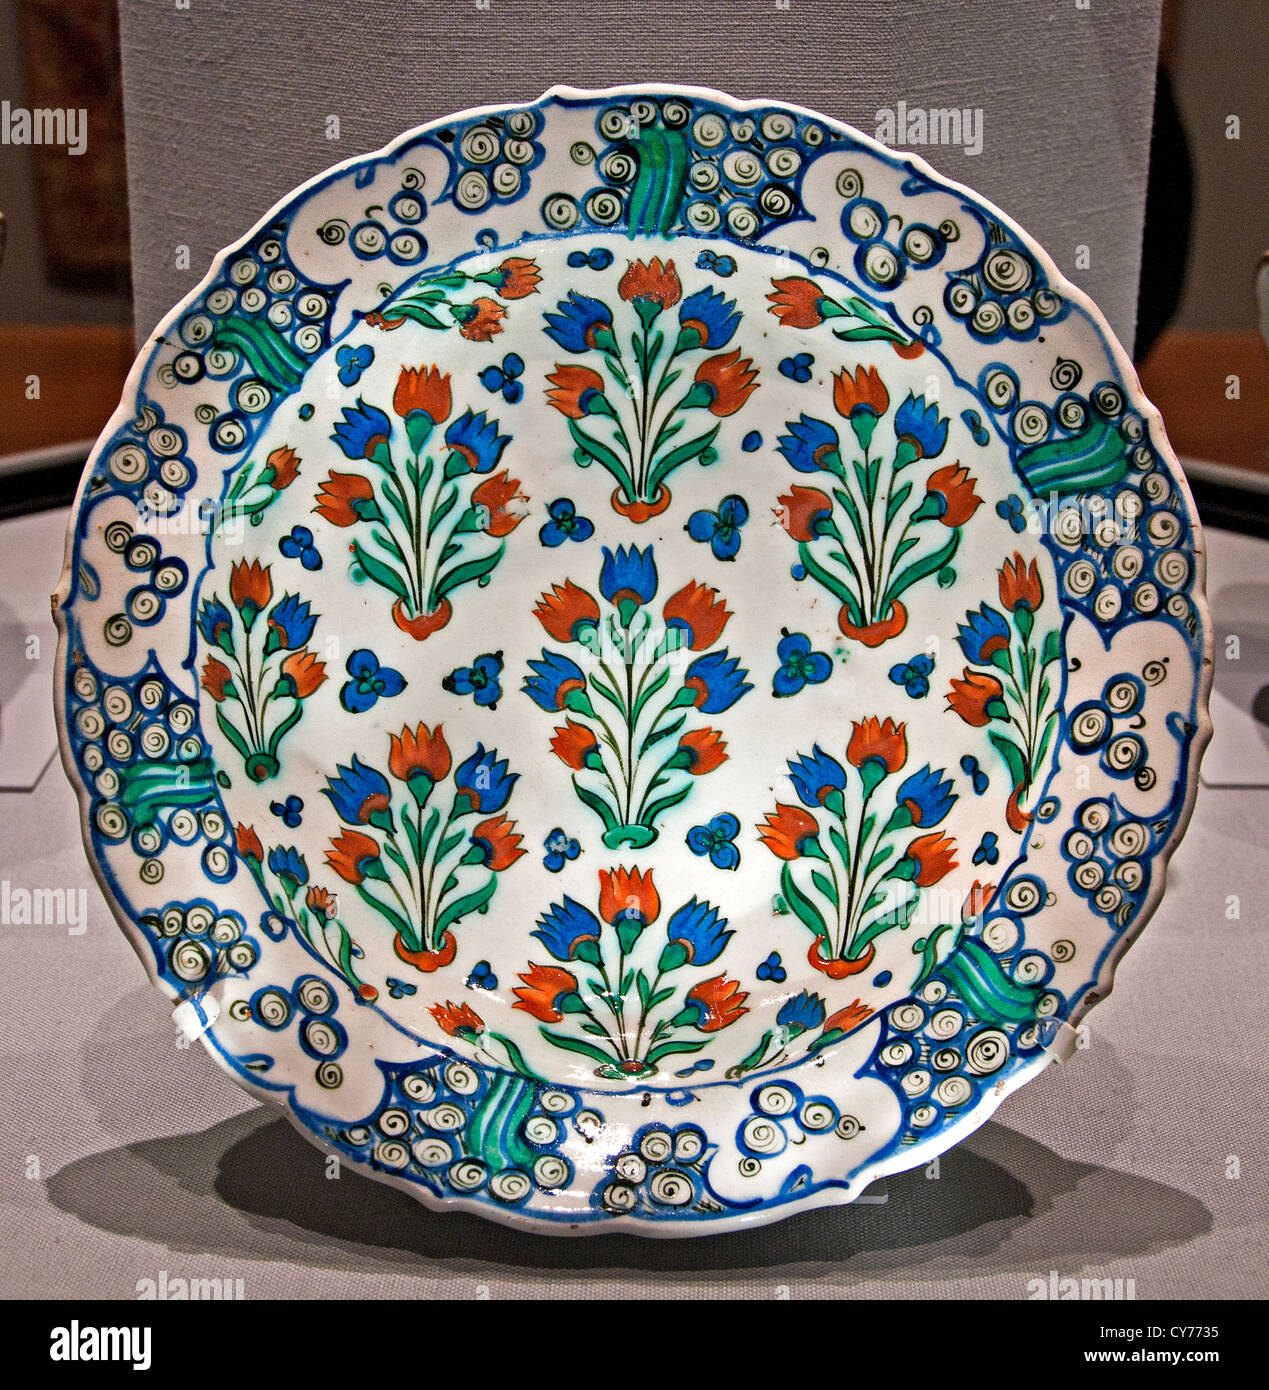 Iznik stonepaste Ottoman Dish with Scale pattern design 1585 - 1590 Iznik  plate Turkey Turkeys - Stock Image